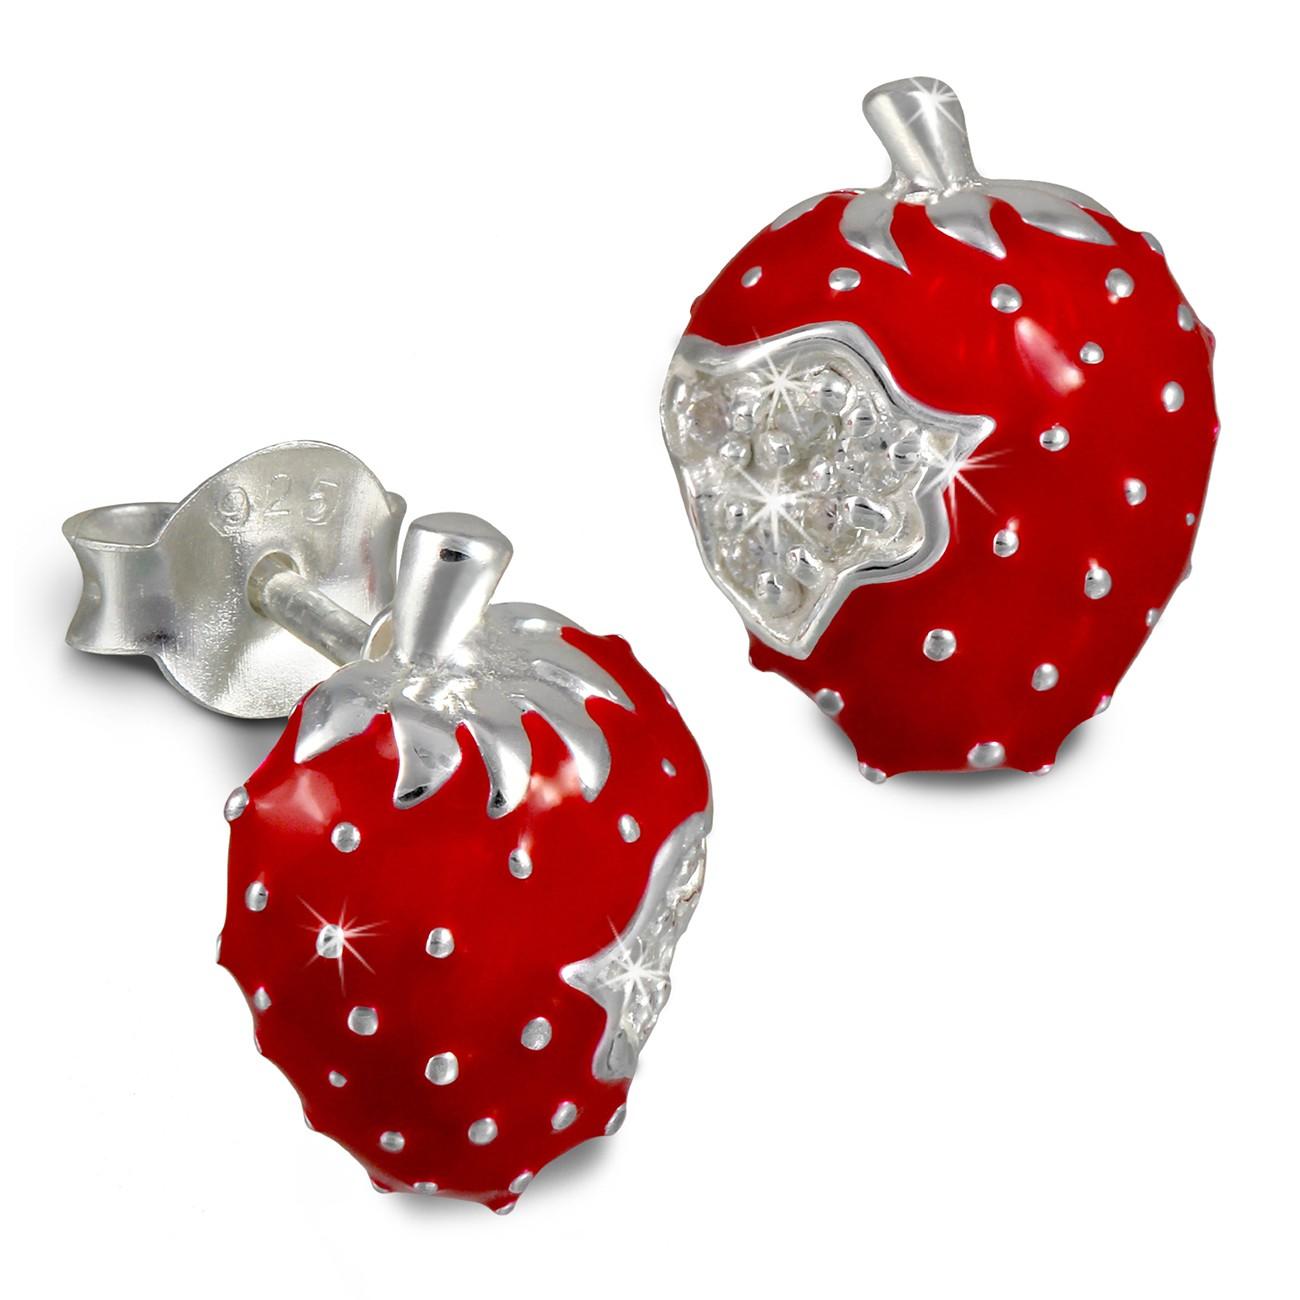 Kinder Ohrring Erdbeere rot Silber Ohrstecker Kinderschmuck TW SDO8115R